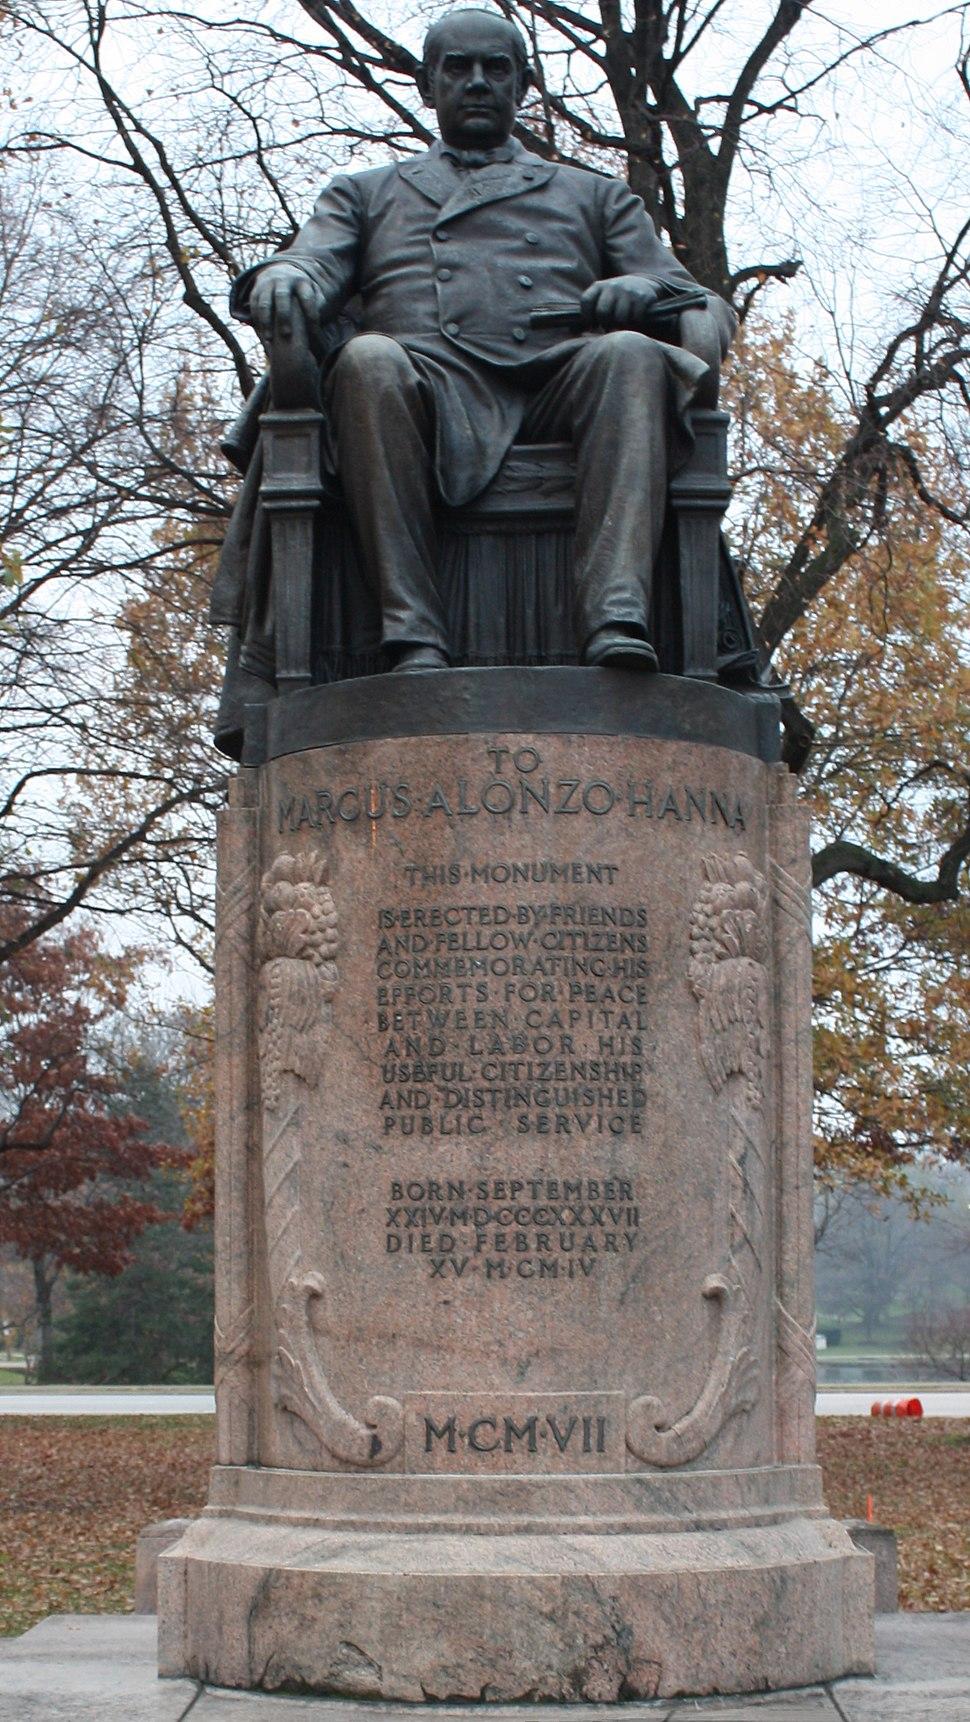 Hanna statue